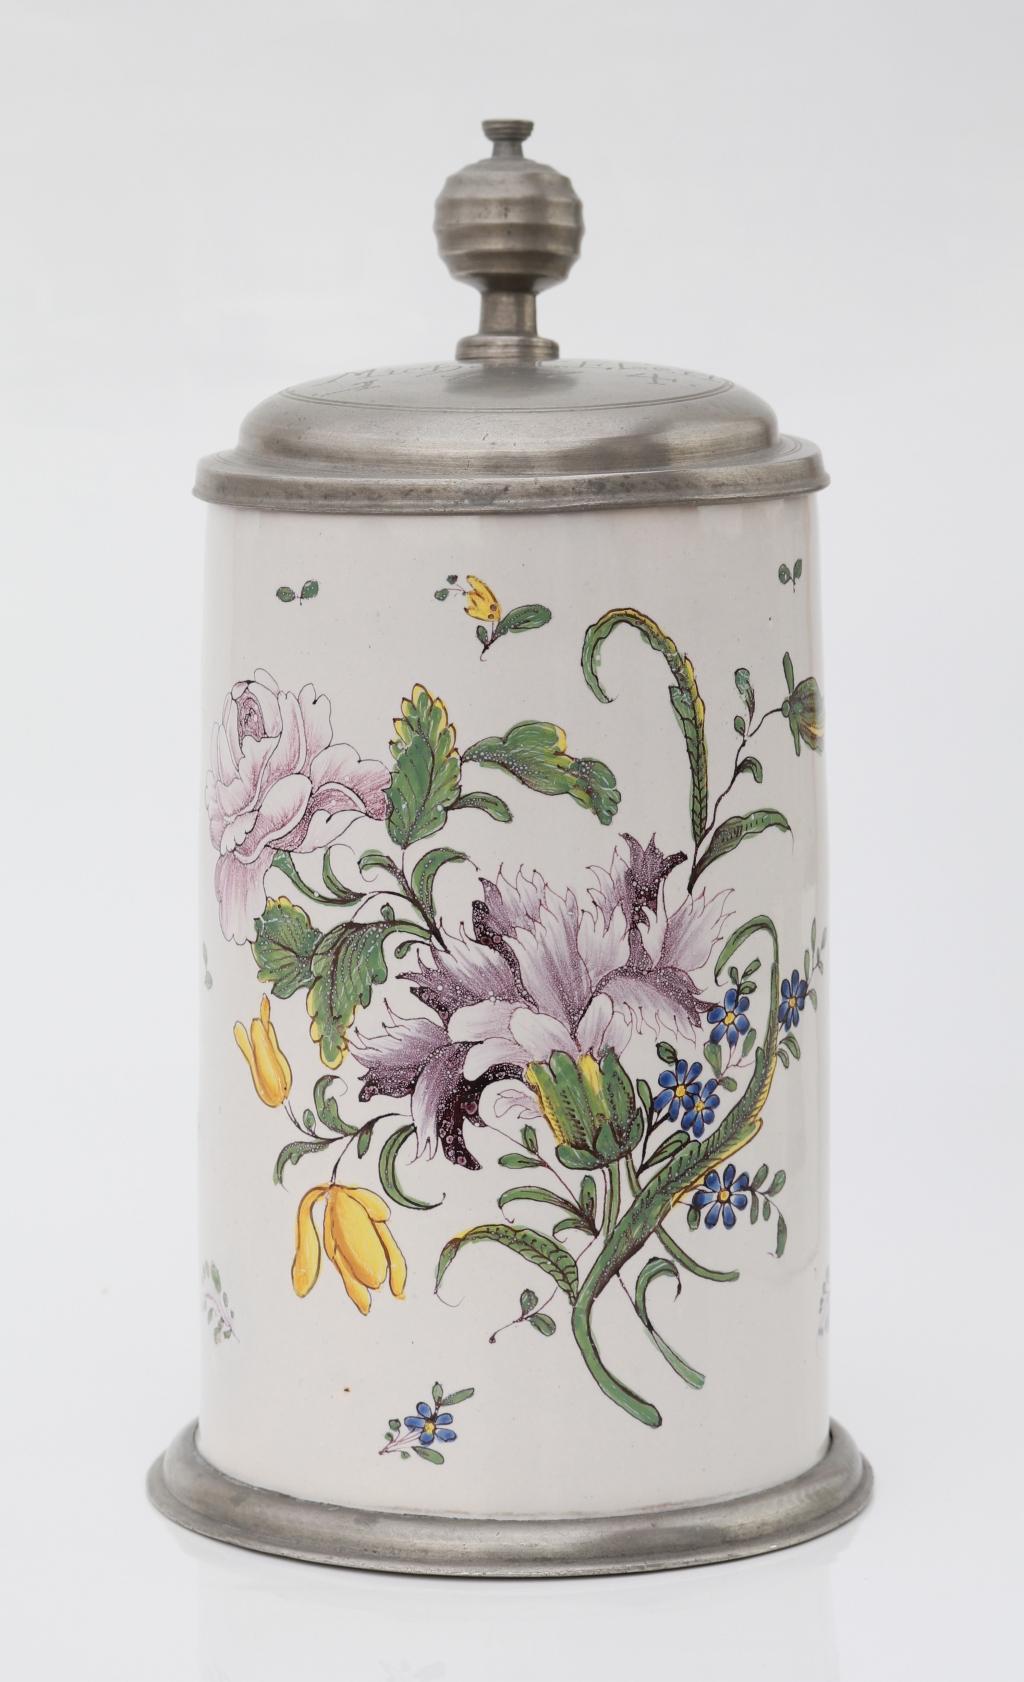 Crailsheimer Fayence Blumenkrug um 1774